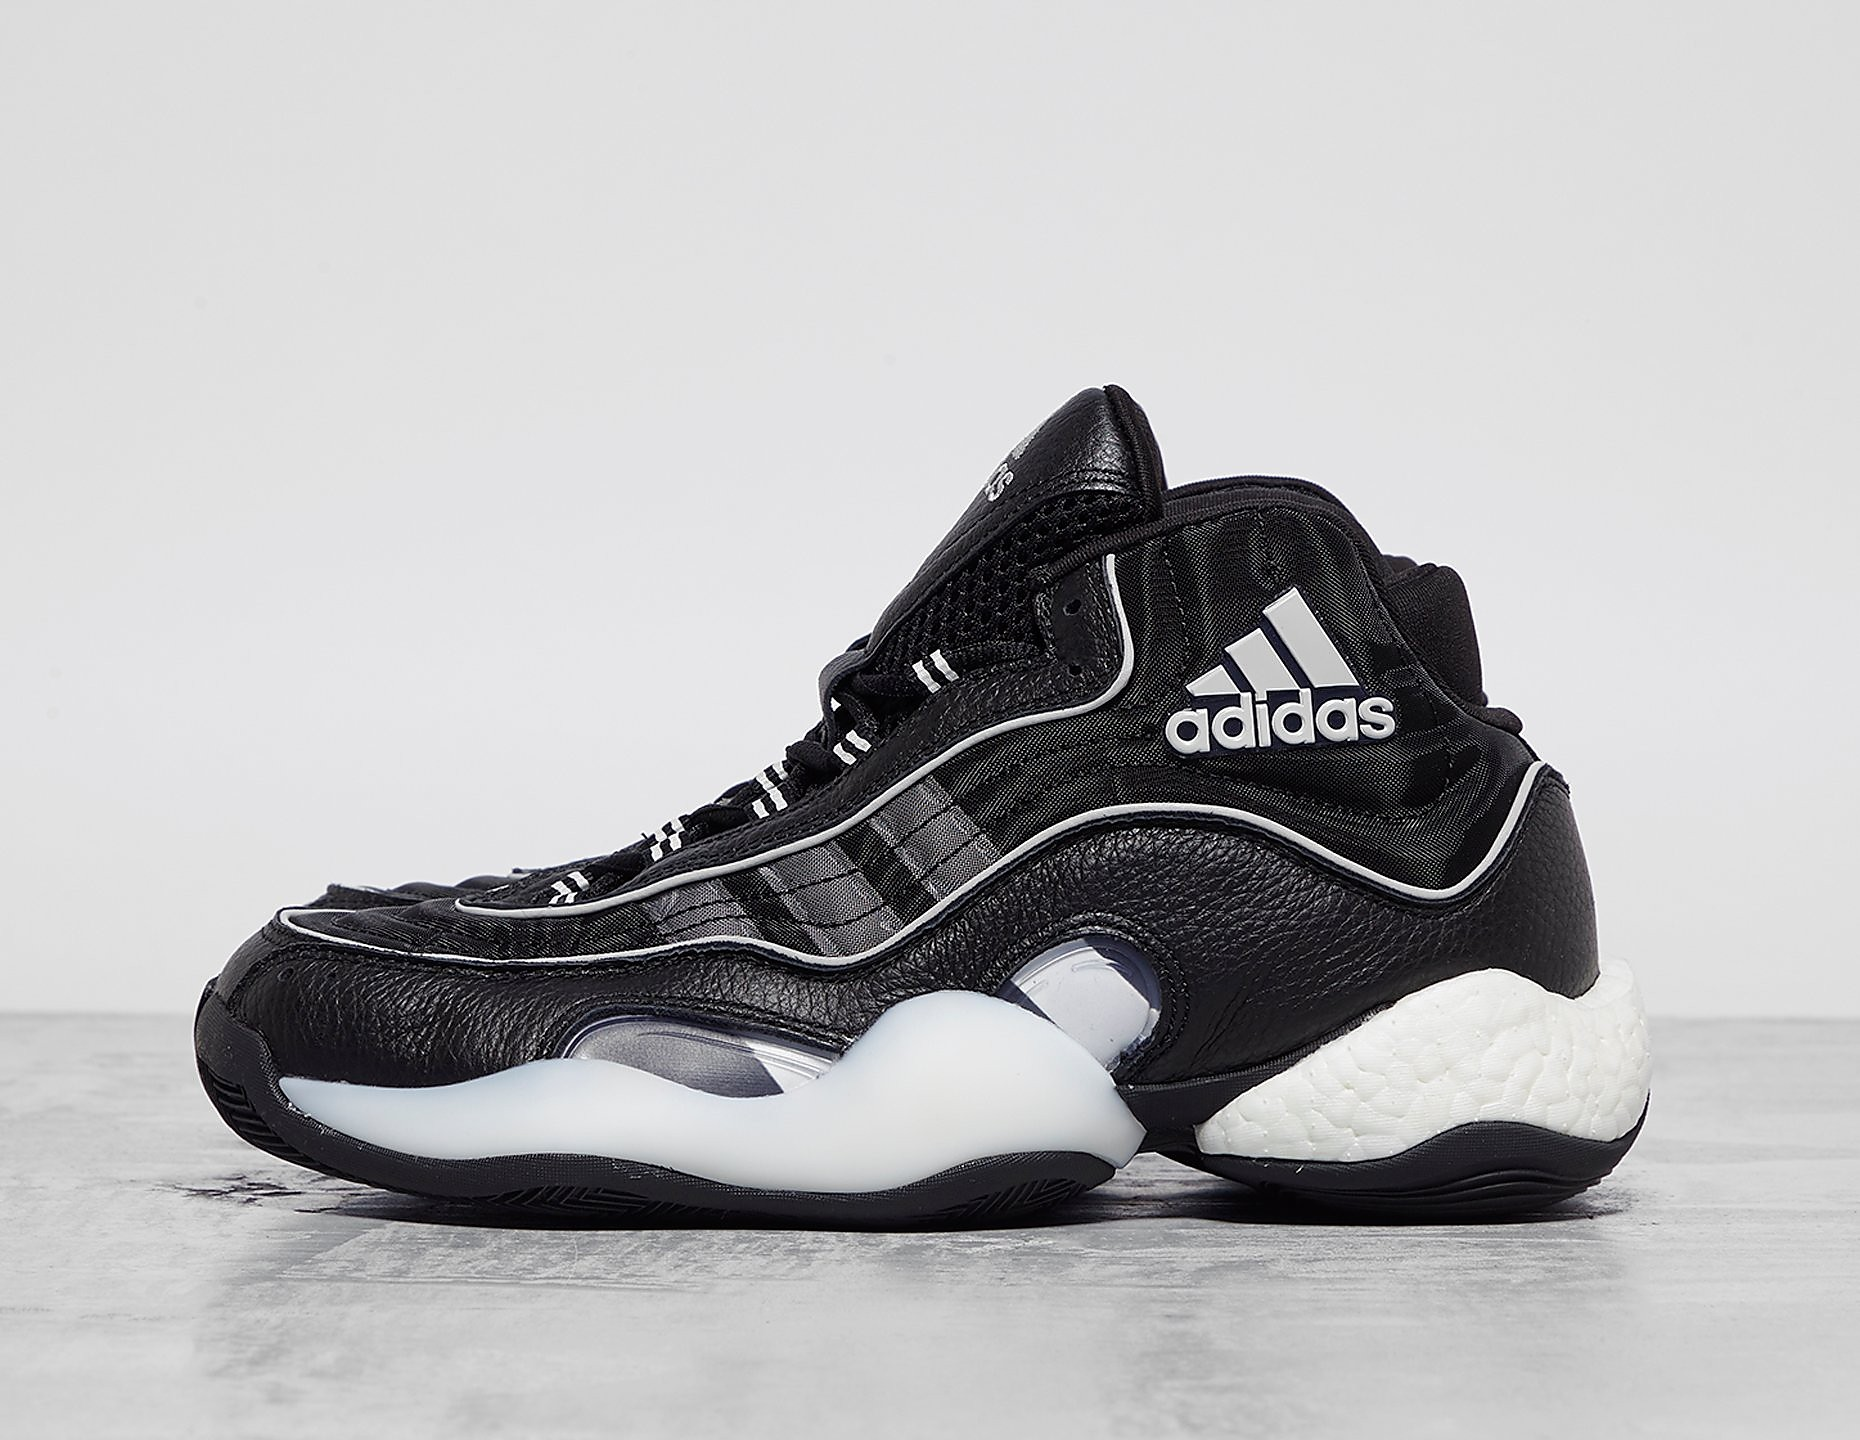 adidas Originals 98 x Crazy BYW